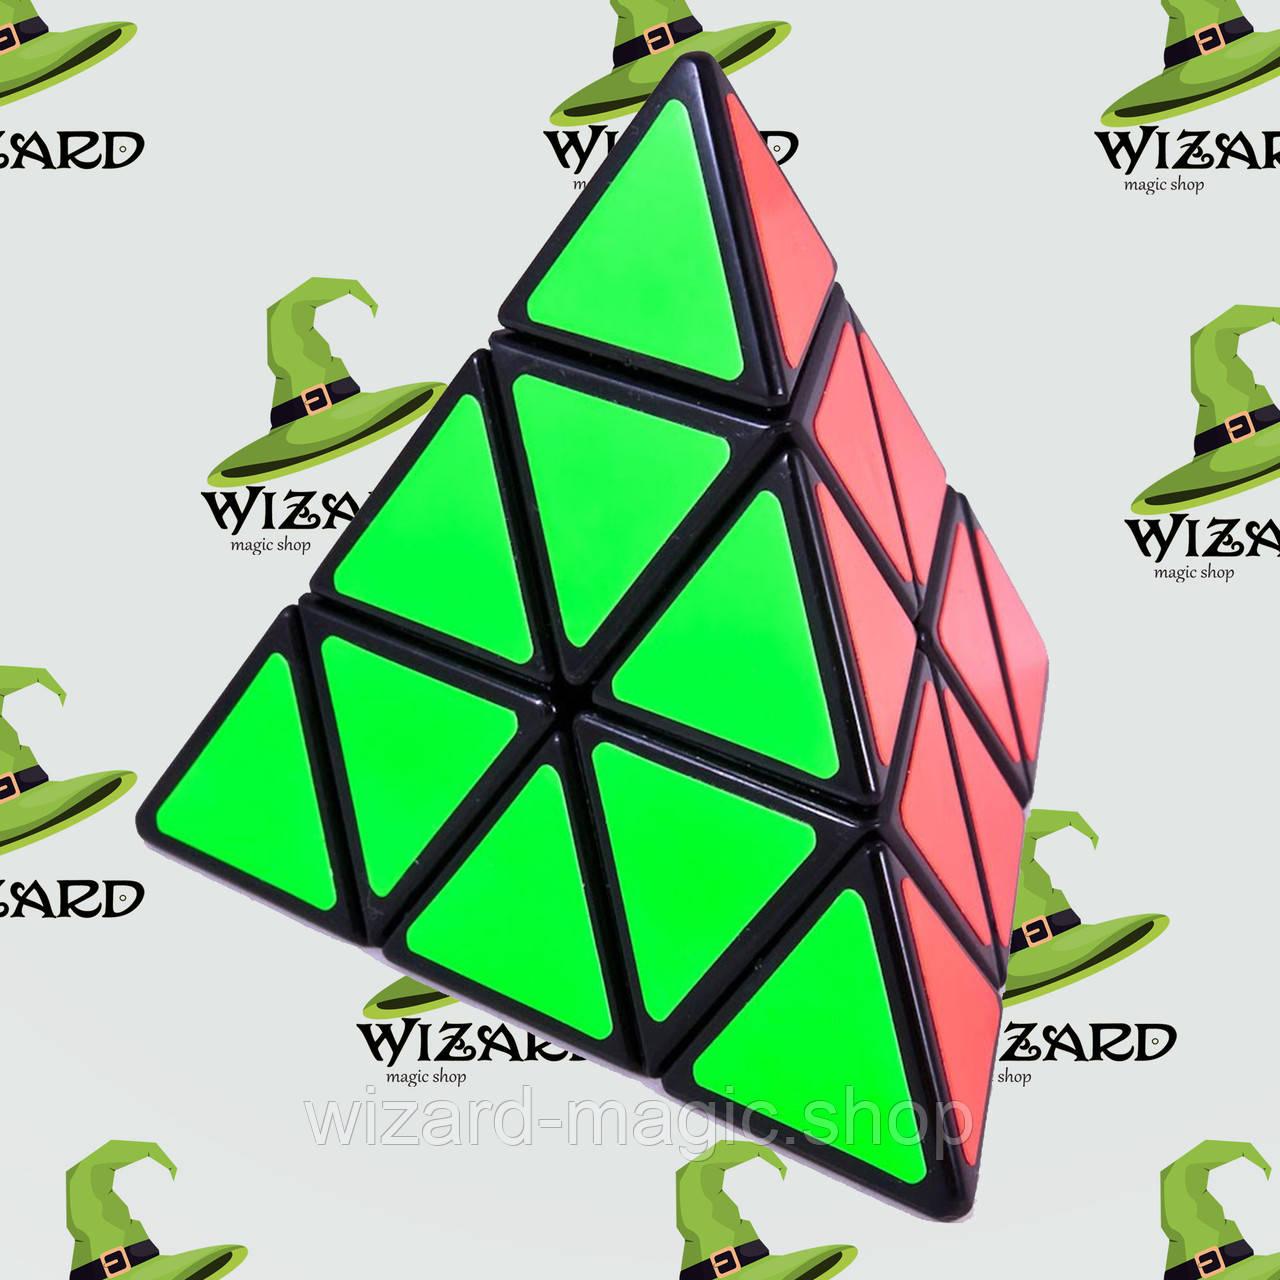 Кубик Рубика Пирамидка Мефферта черная